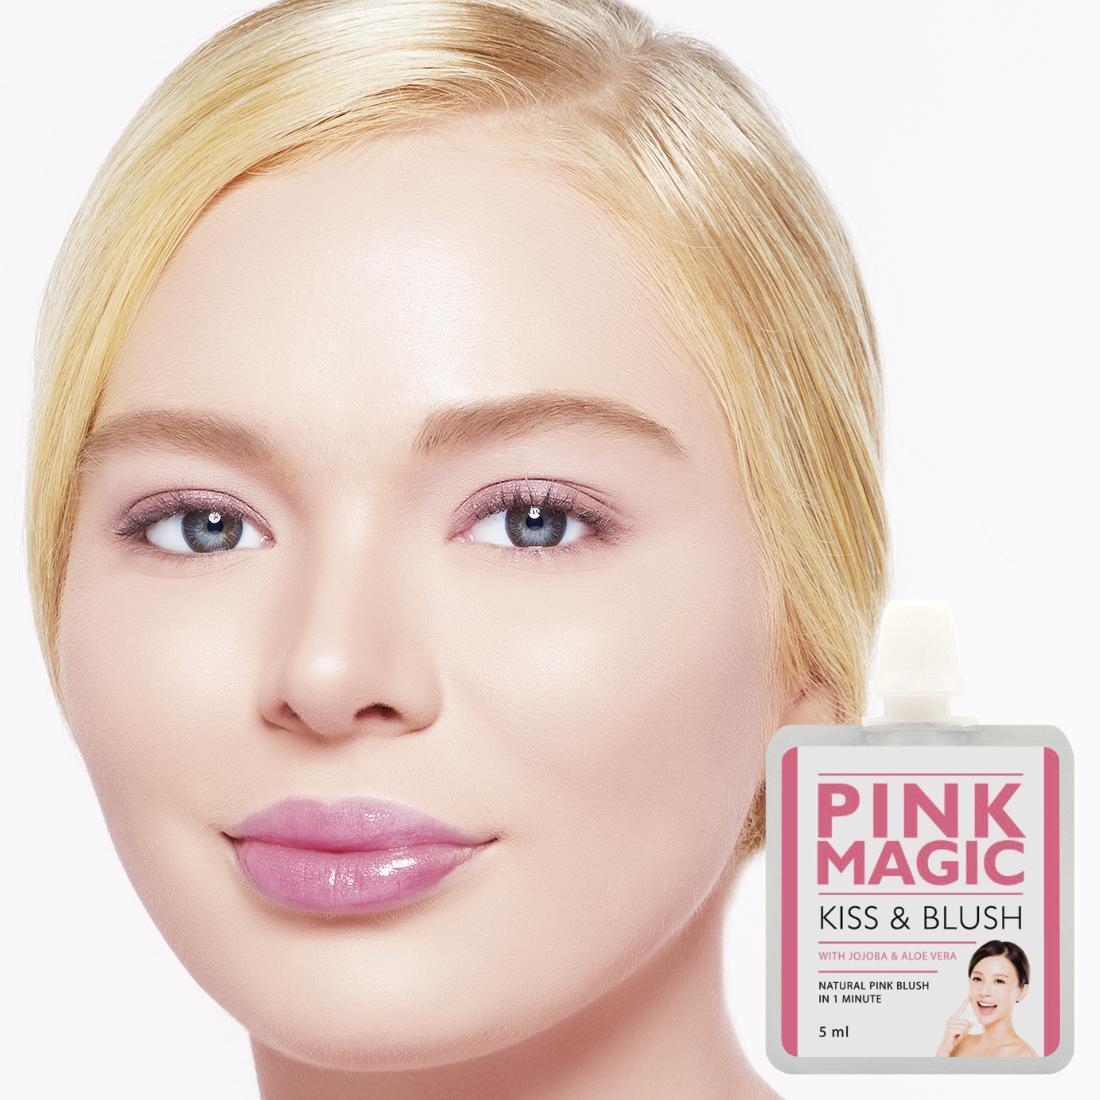 BRUNBRUN PARIS - Pink Magic Kiss & Blush